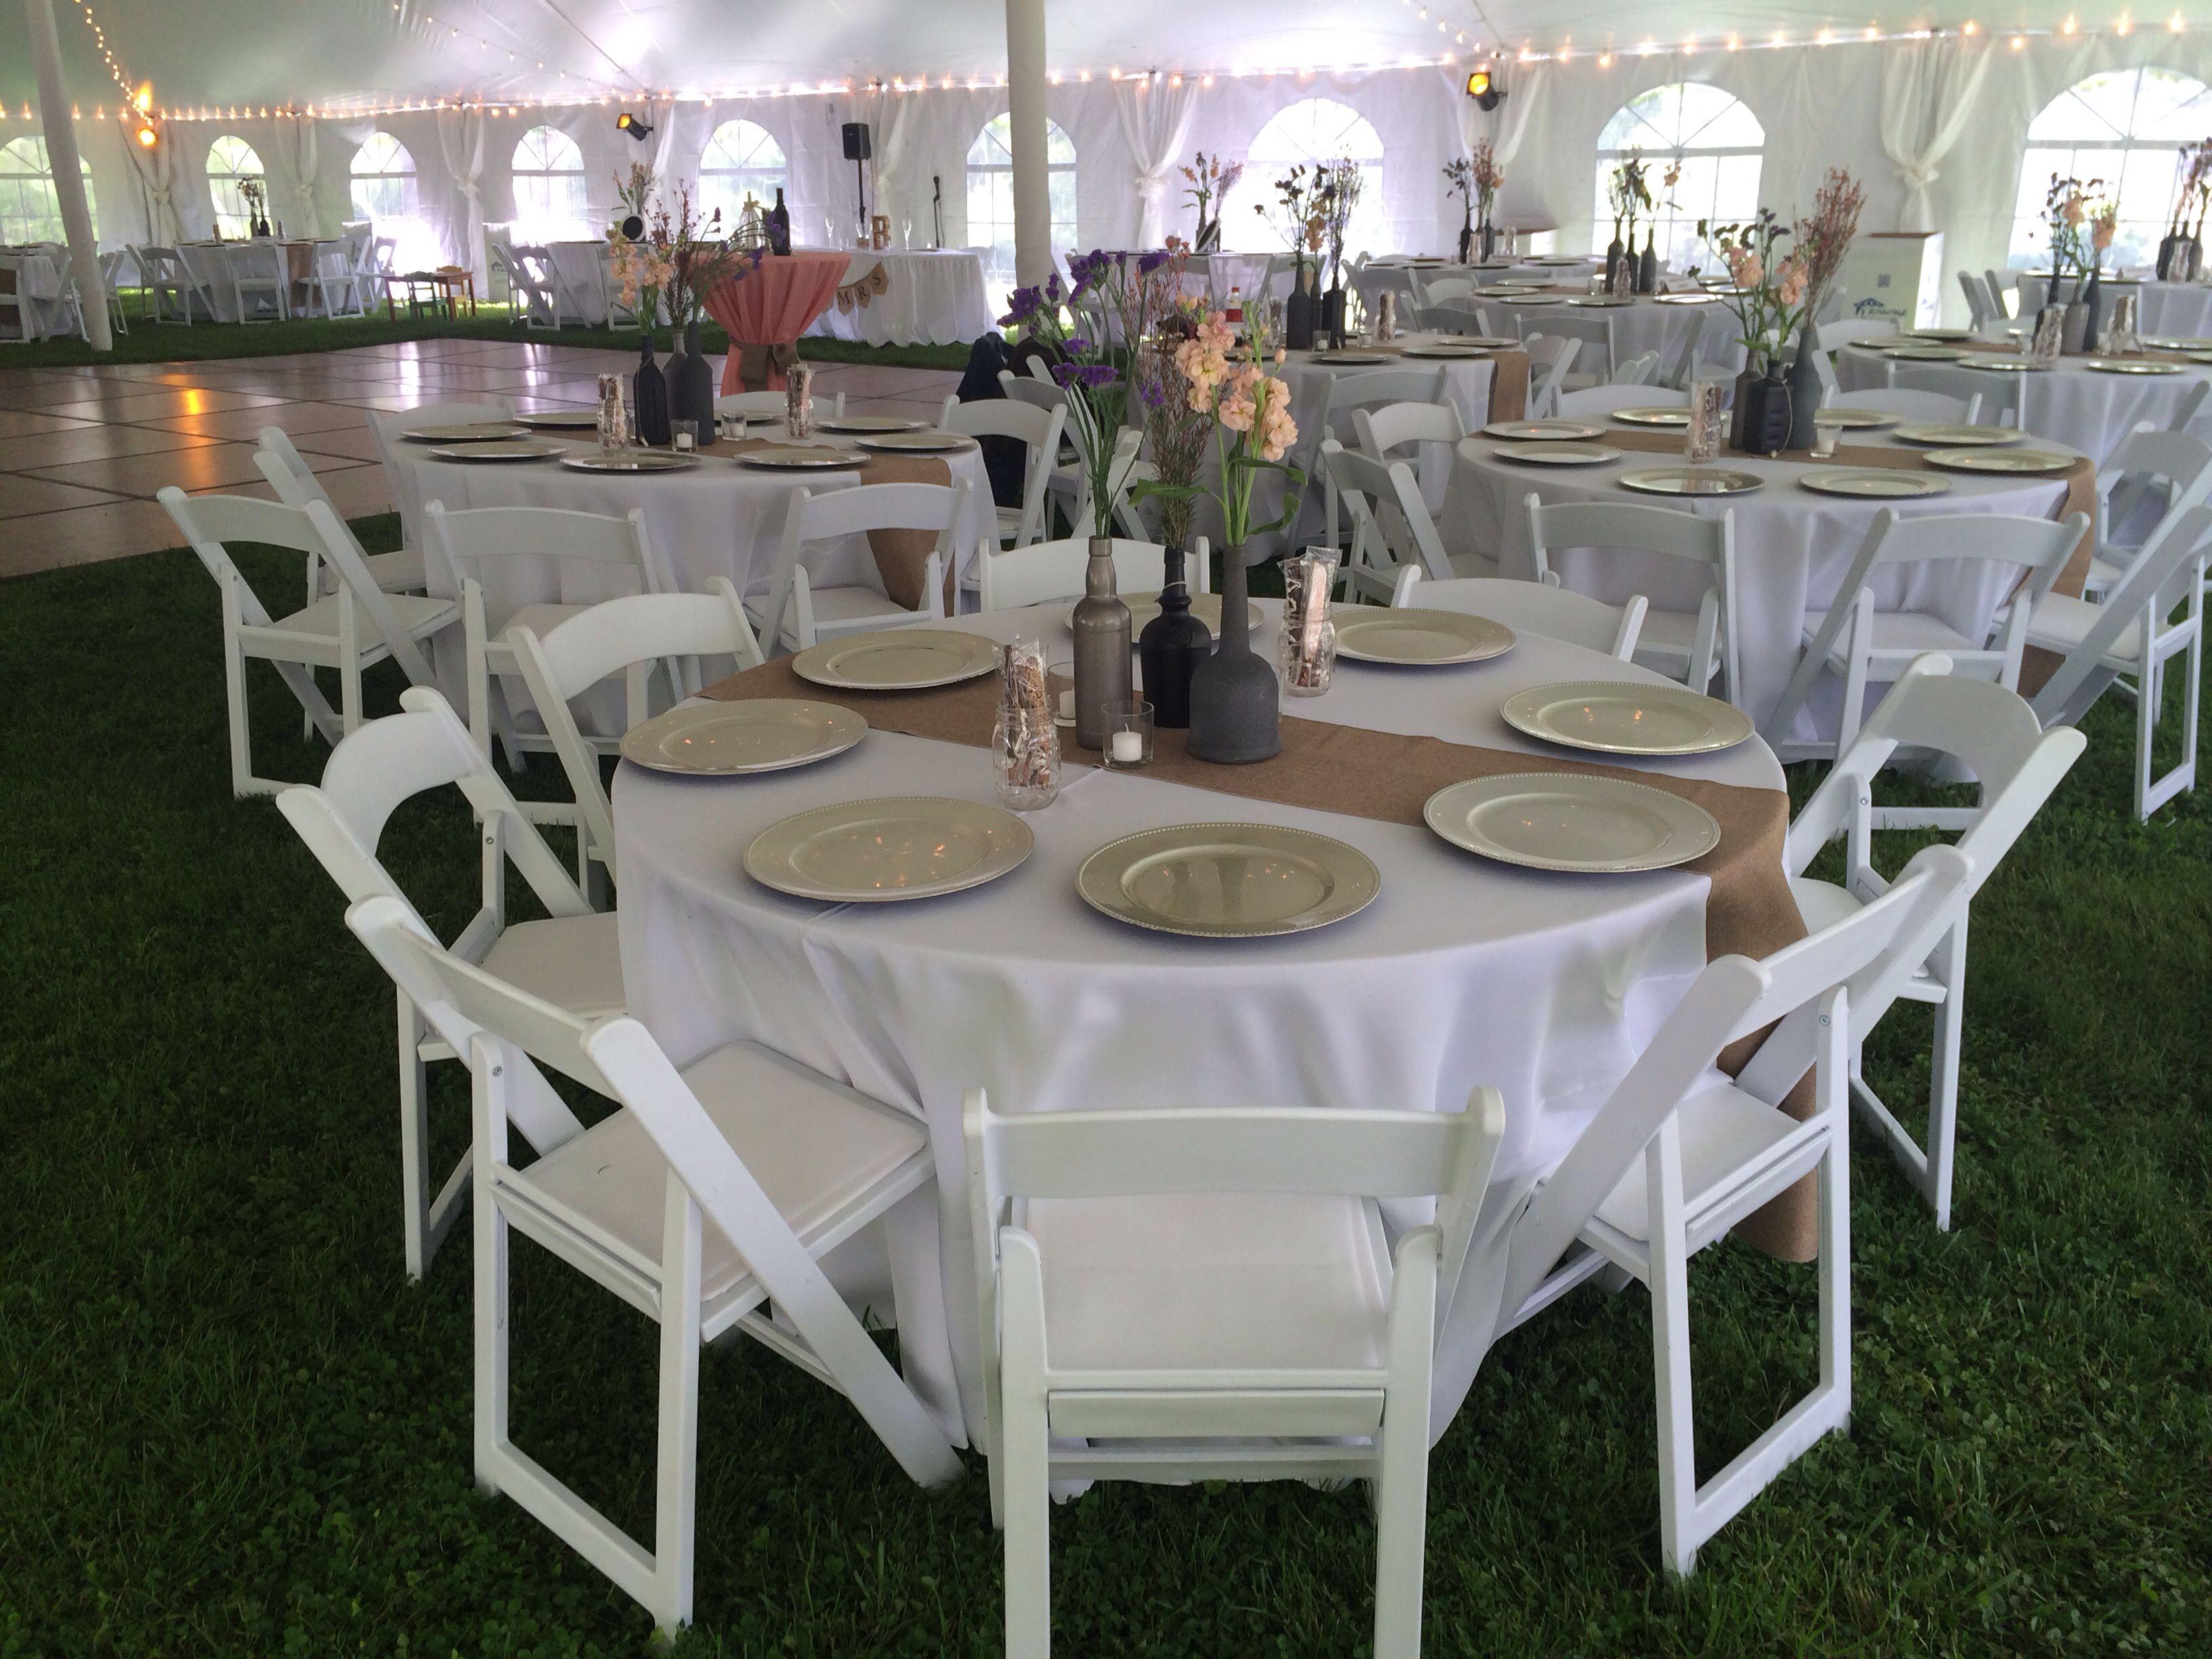 Kim Stucker Wedding May 17 2014 Quot 5 5 Round Table 120